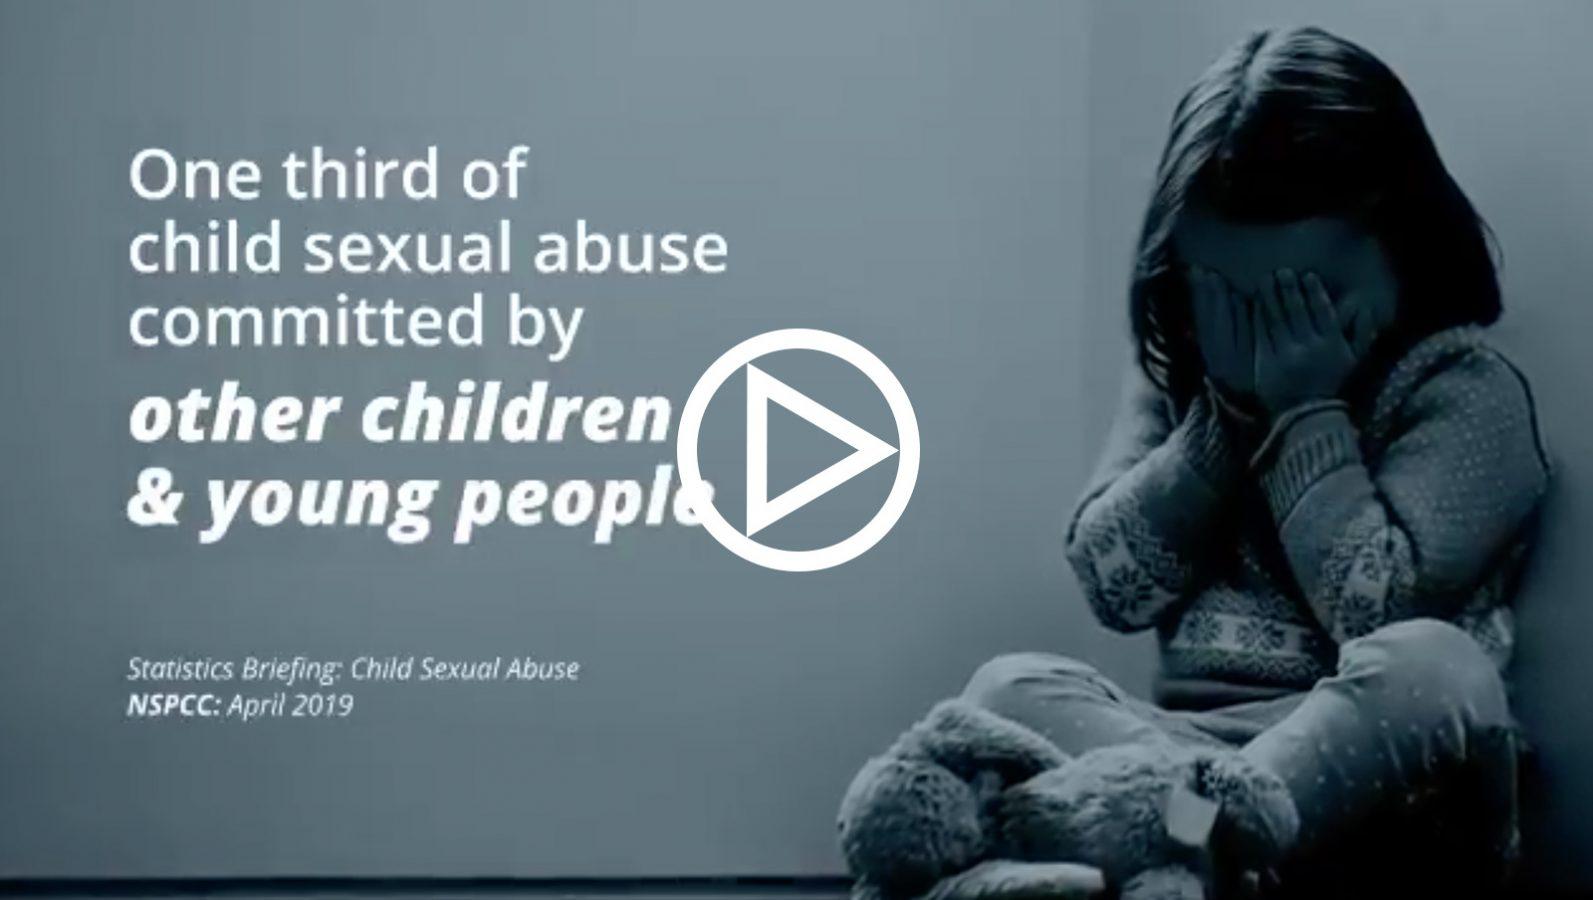 Does RSE harm children - video